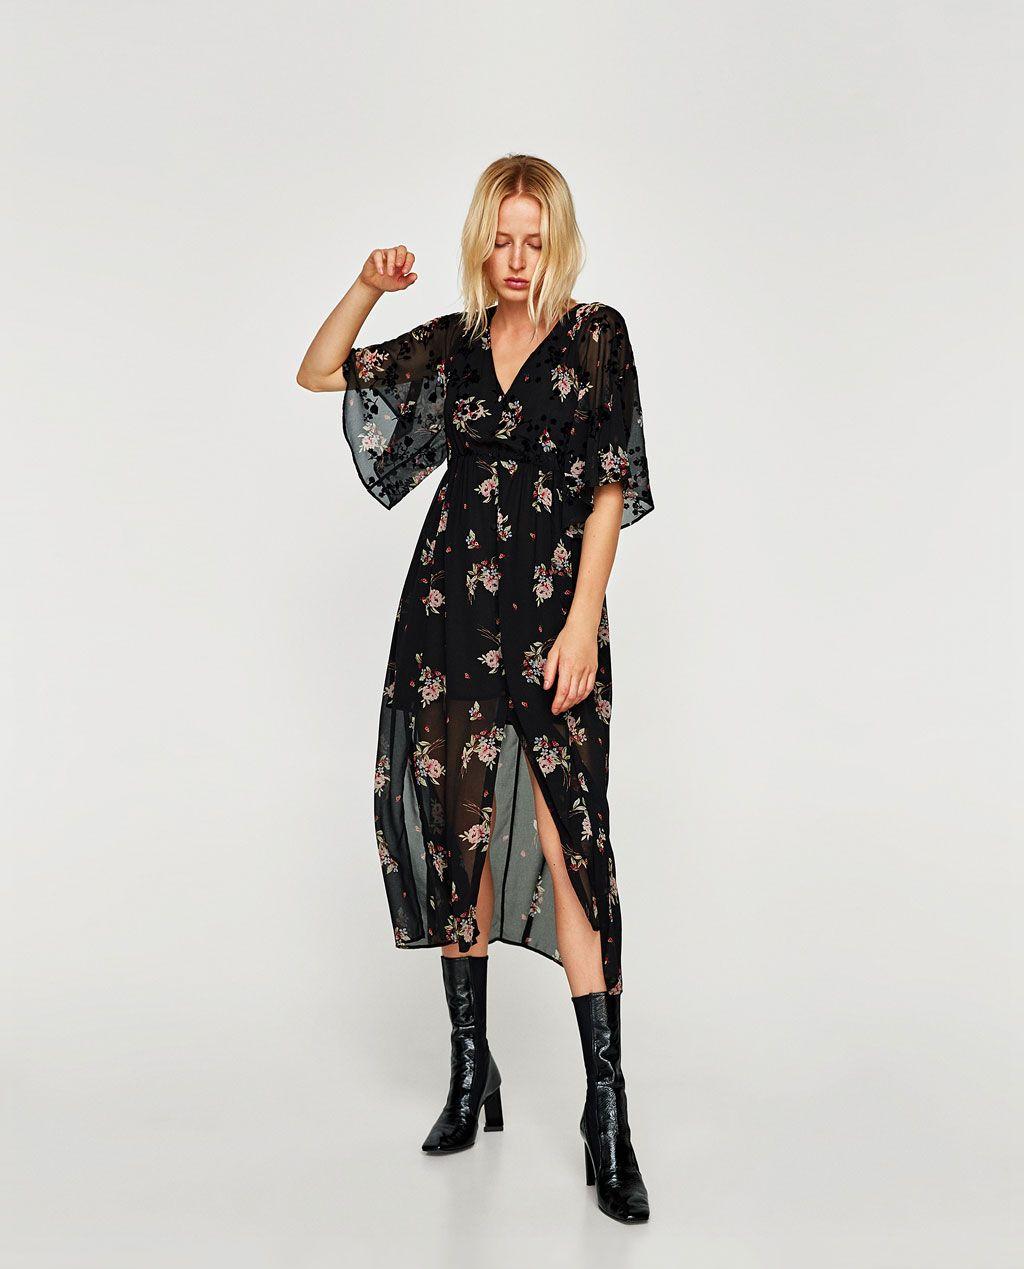 vestido largo aberturas fall winter 2017 style stuff pinterest lange kleider kleider. Black Bedroom Furniture Sets. Home Design Ideas